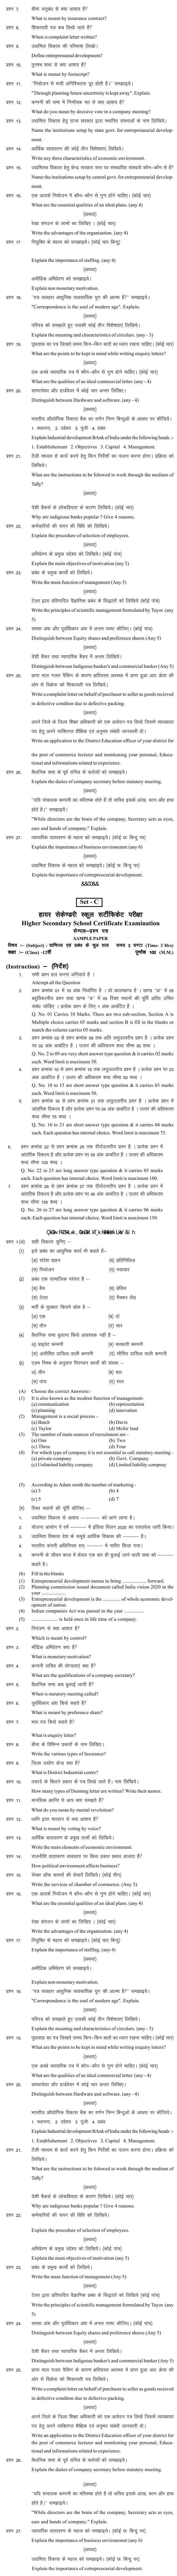 Chattisgarh Board Class 12 Commerce and Management Basics (Vanijya evam prabandh ke mool tatva)Sample Paper